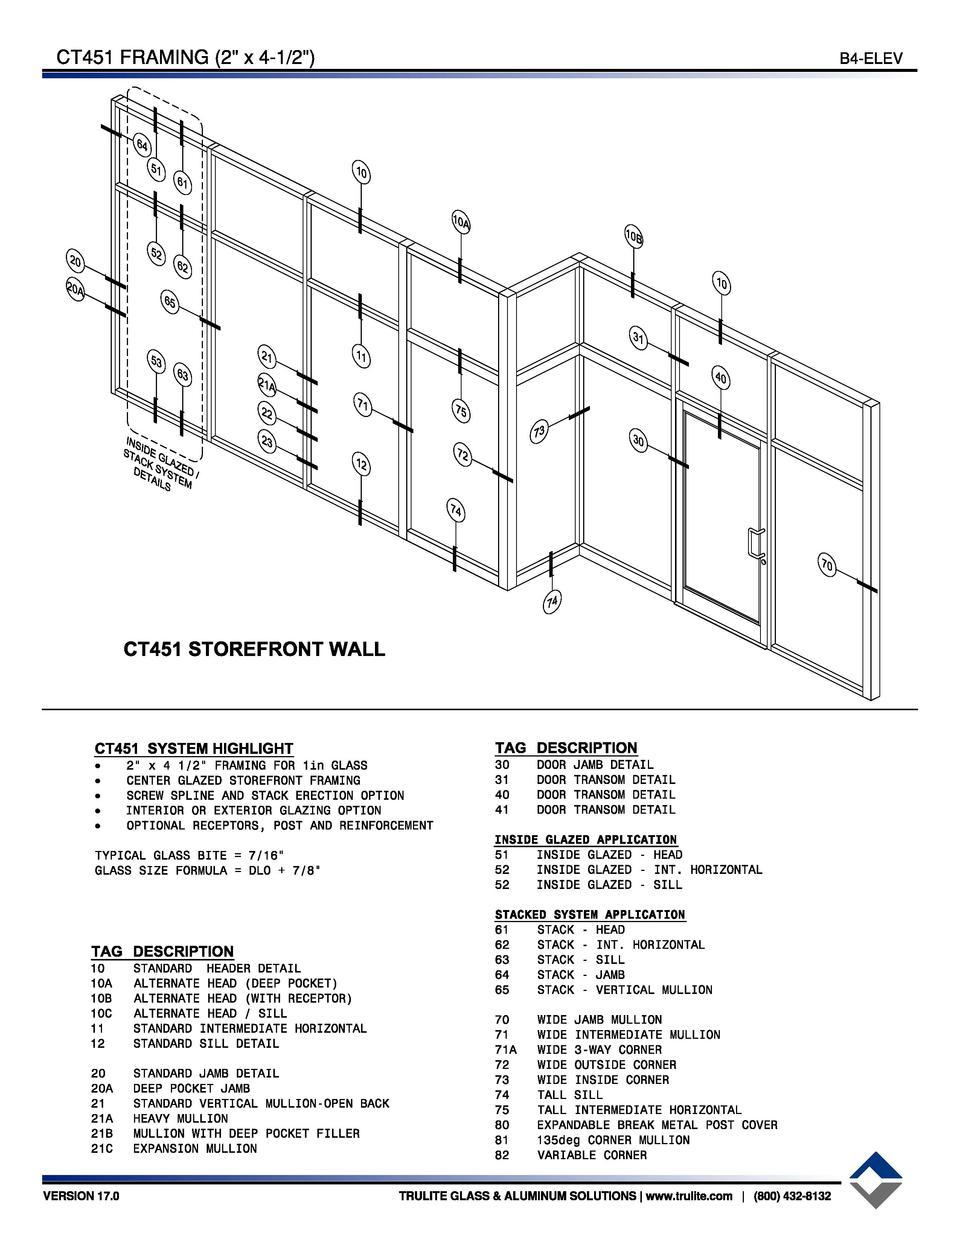 B4 CG450 STOREFRONT SYSTEM 1 3 4 x 4 1 2 CENTER GLAZED SYSTEM B1 1 CT451 S T O R E F R O N T DETAILBOOK 2 x 4 1 2 THERMAL CENTER GLAZED SYSTEM TRULITE TM ...  sc 1 st  SimpleBooklet & Trulite-CT451 : simplebooklet.com